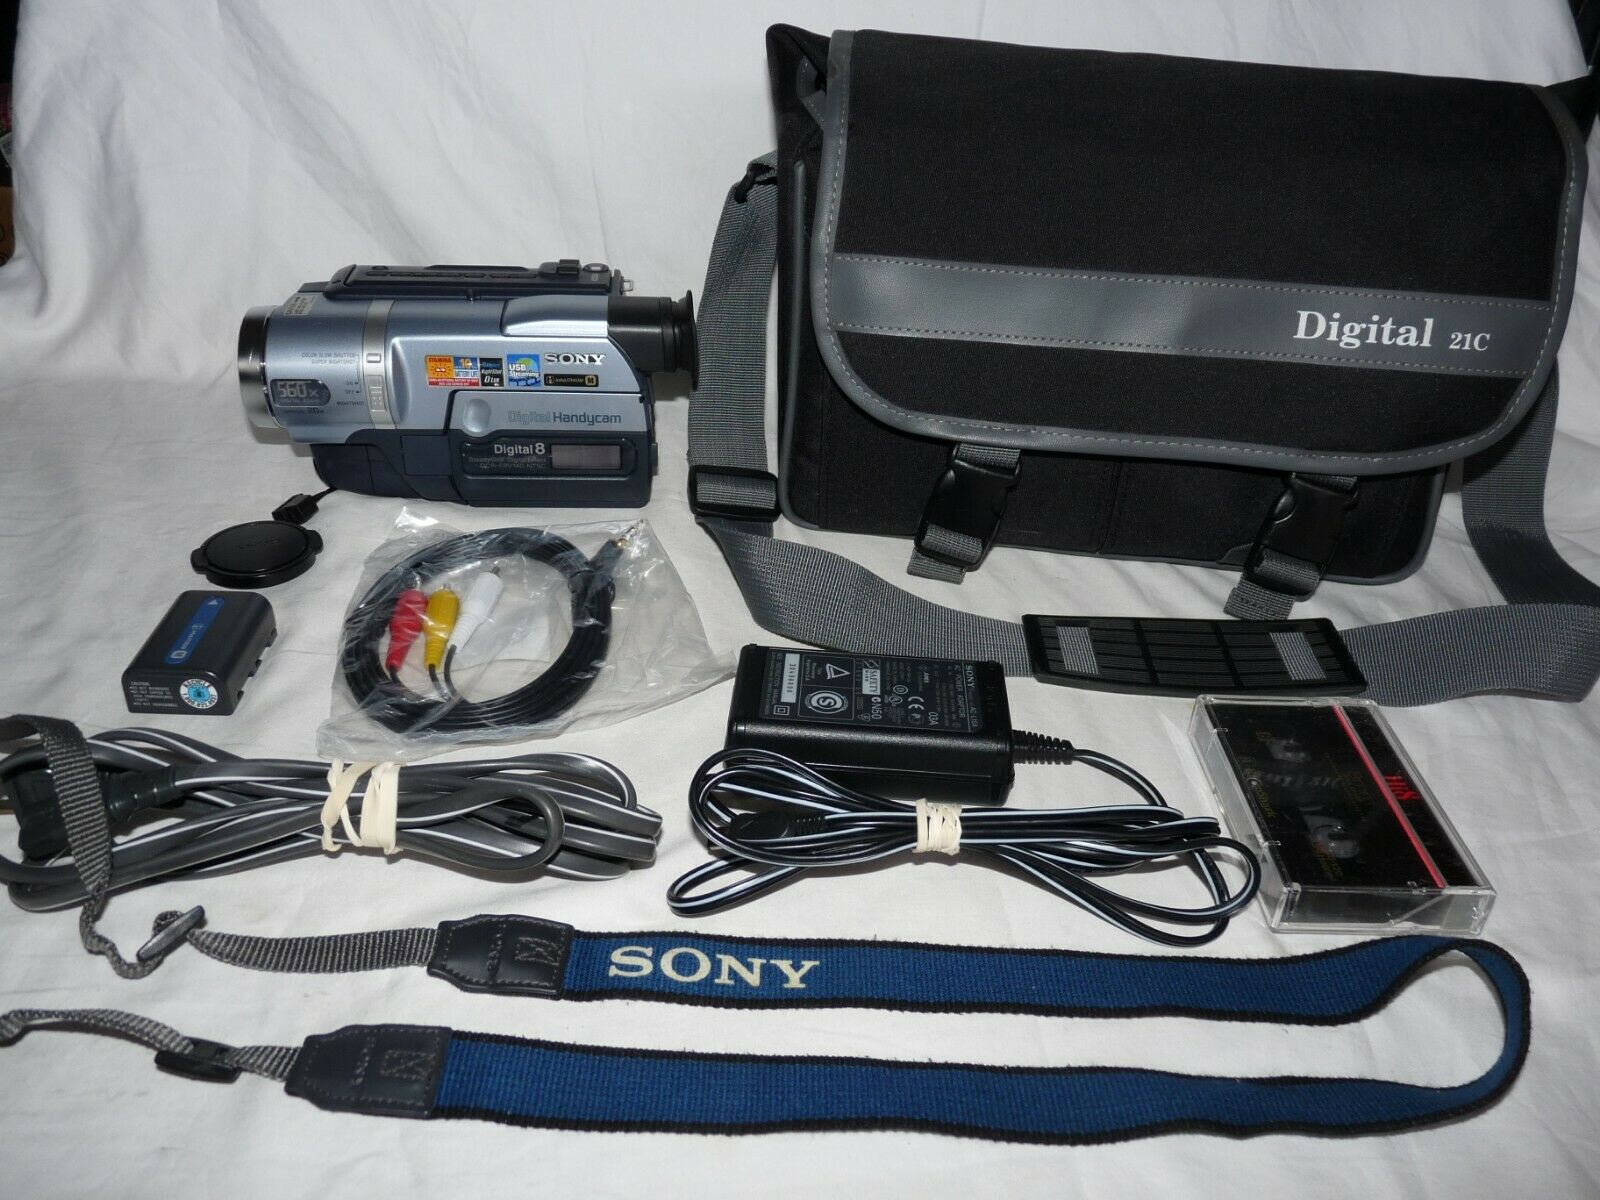 s l1600 - Sony DCR-TRV140 Digital8 Digital 8 Camcorder VCR Player Camera Video Transfer